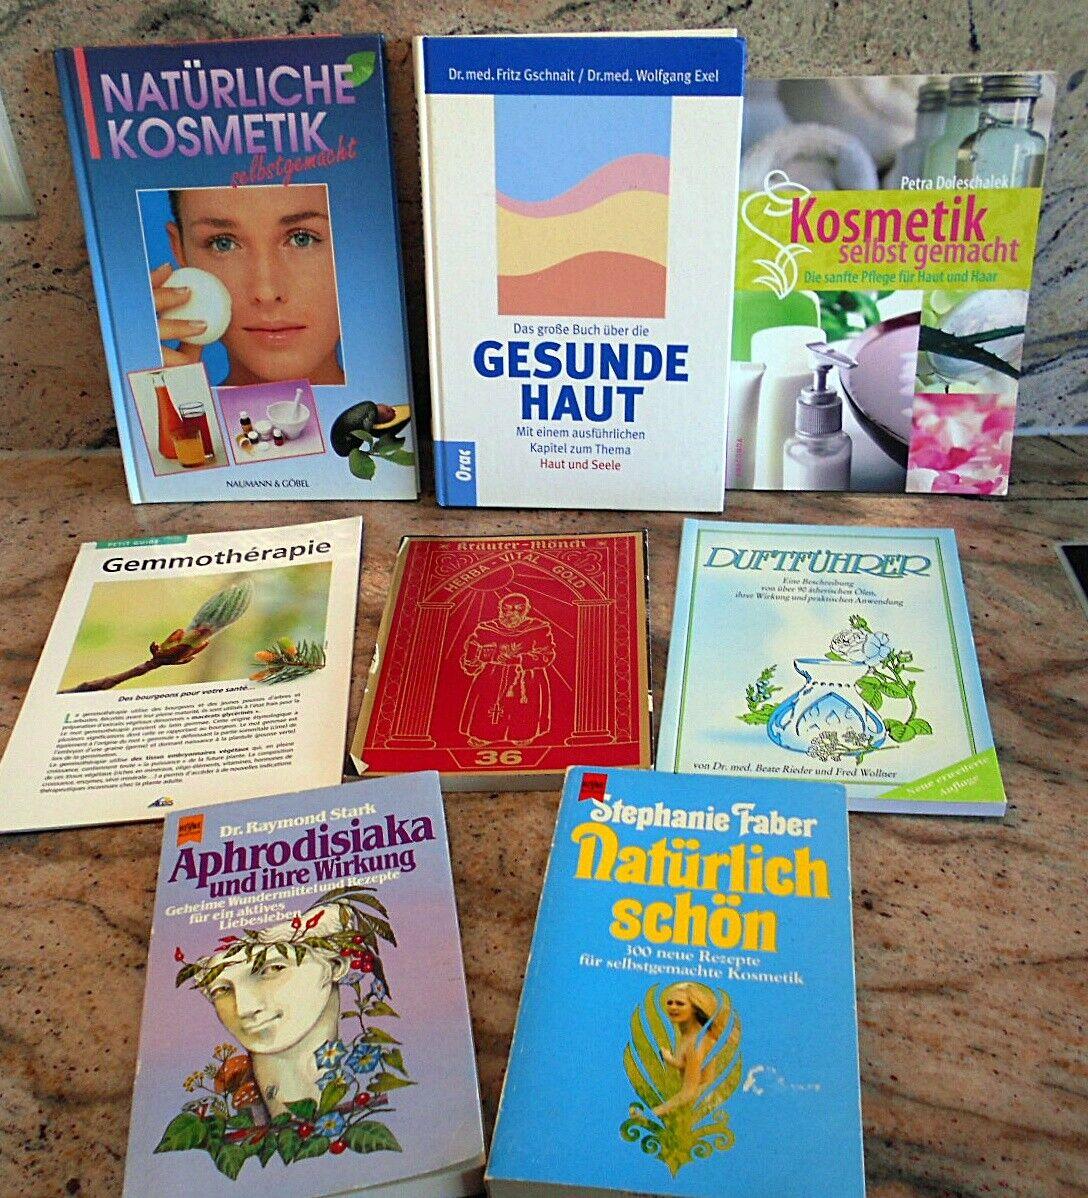 Bücherpaket Kräuter Gemmotherap natürliche Kosmetik selber machen, Aphrodisiaka